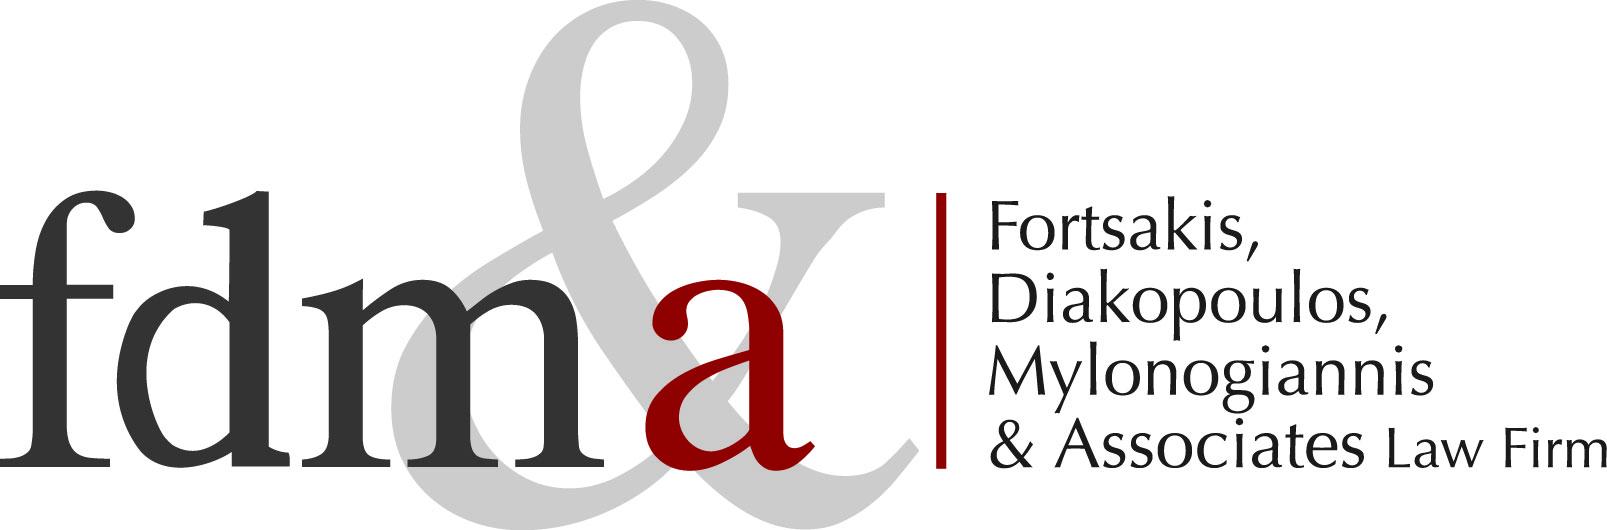 FDMA Law Services | Fortsakis, Diakopoulos, Mylonogiannis & Associates